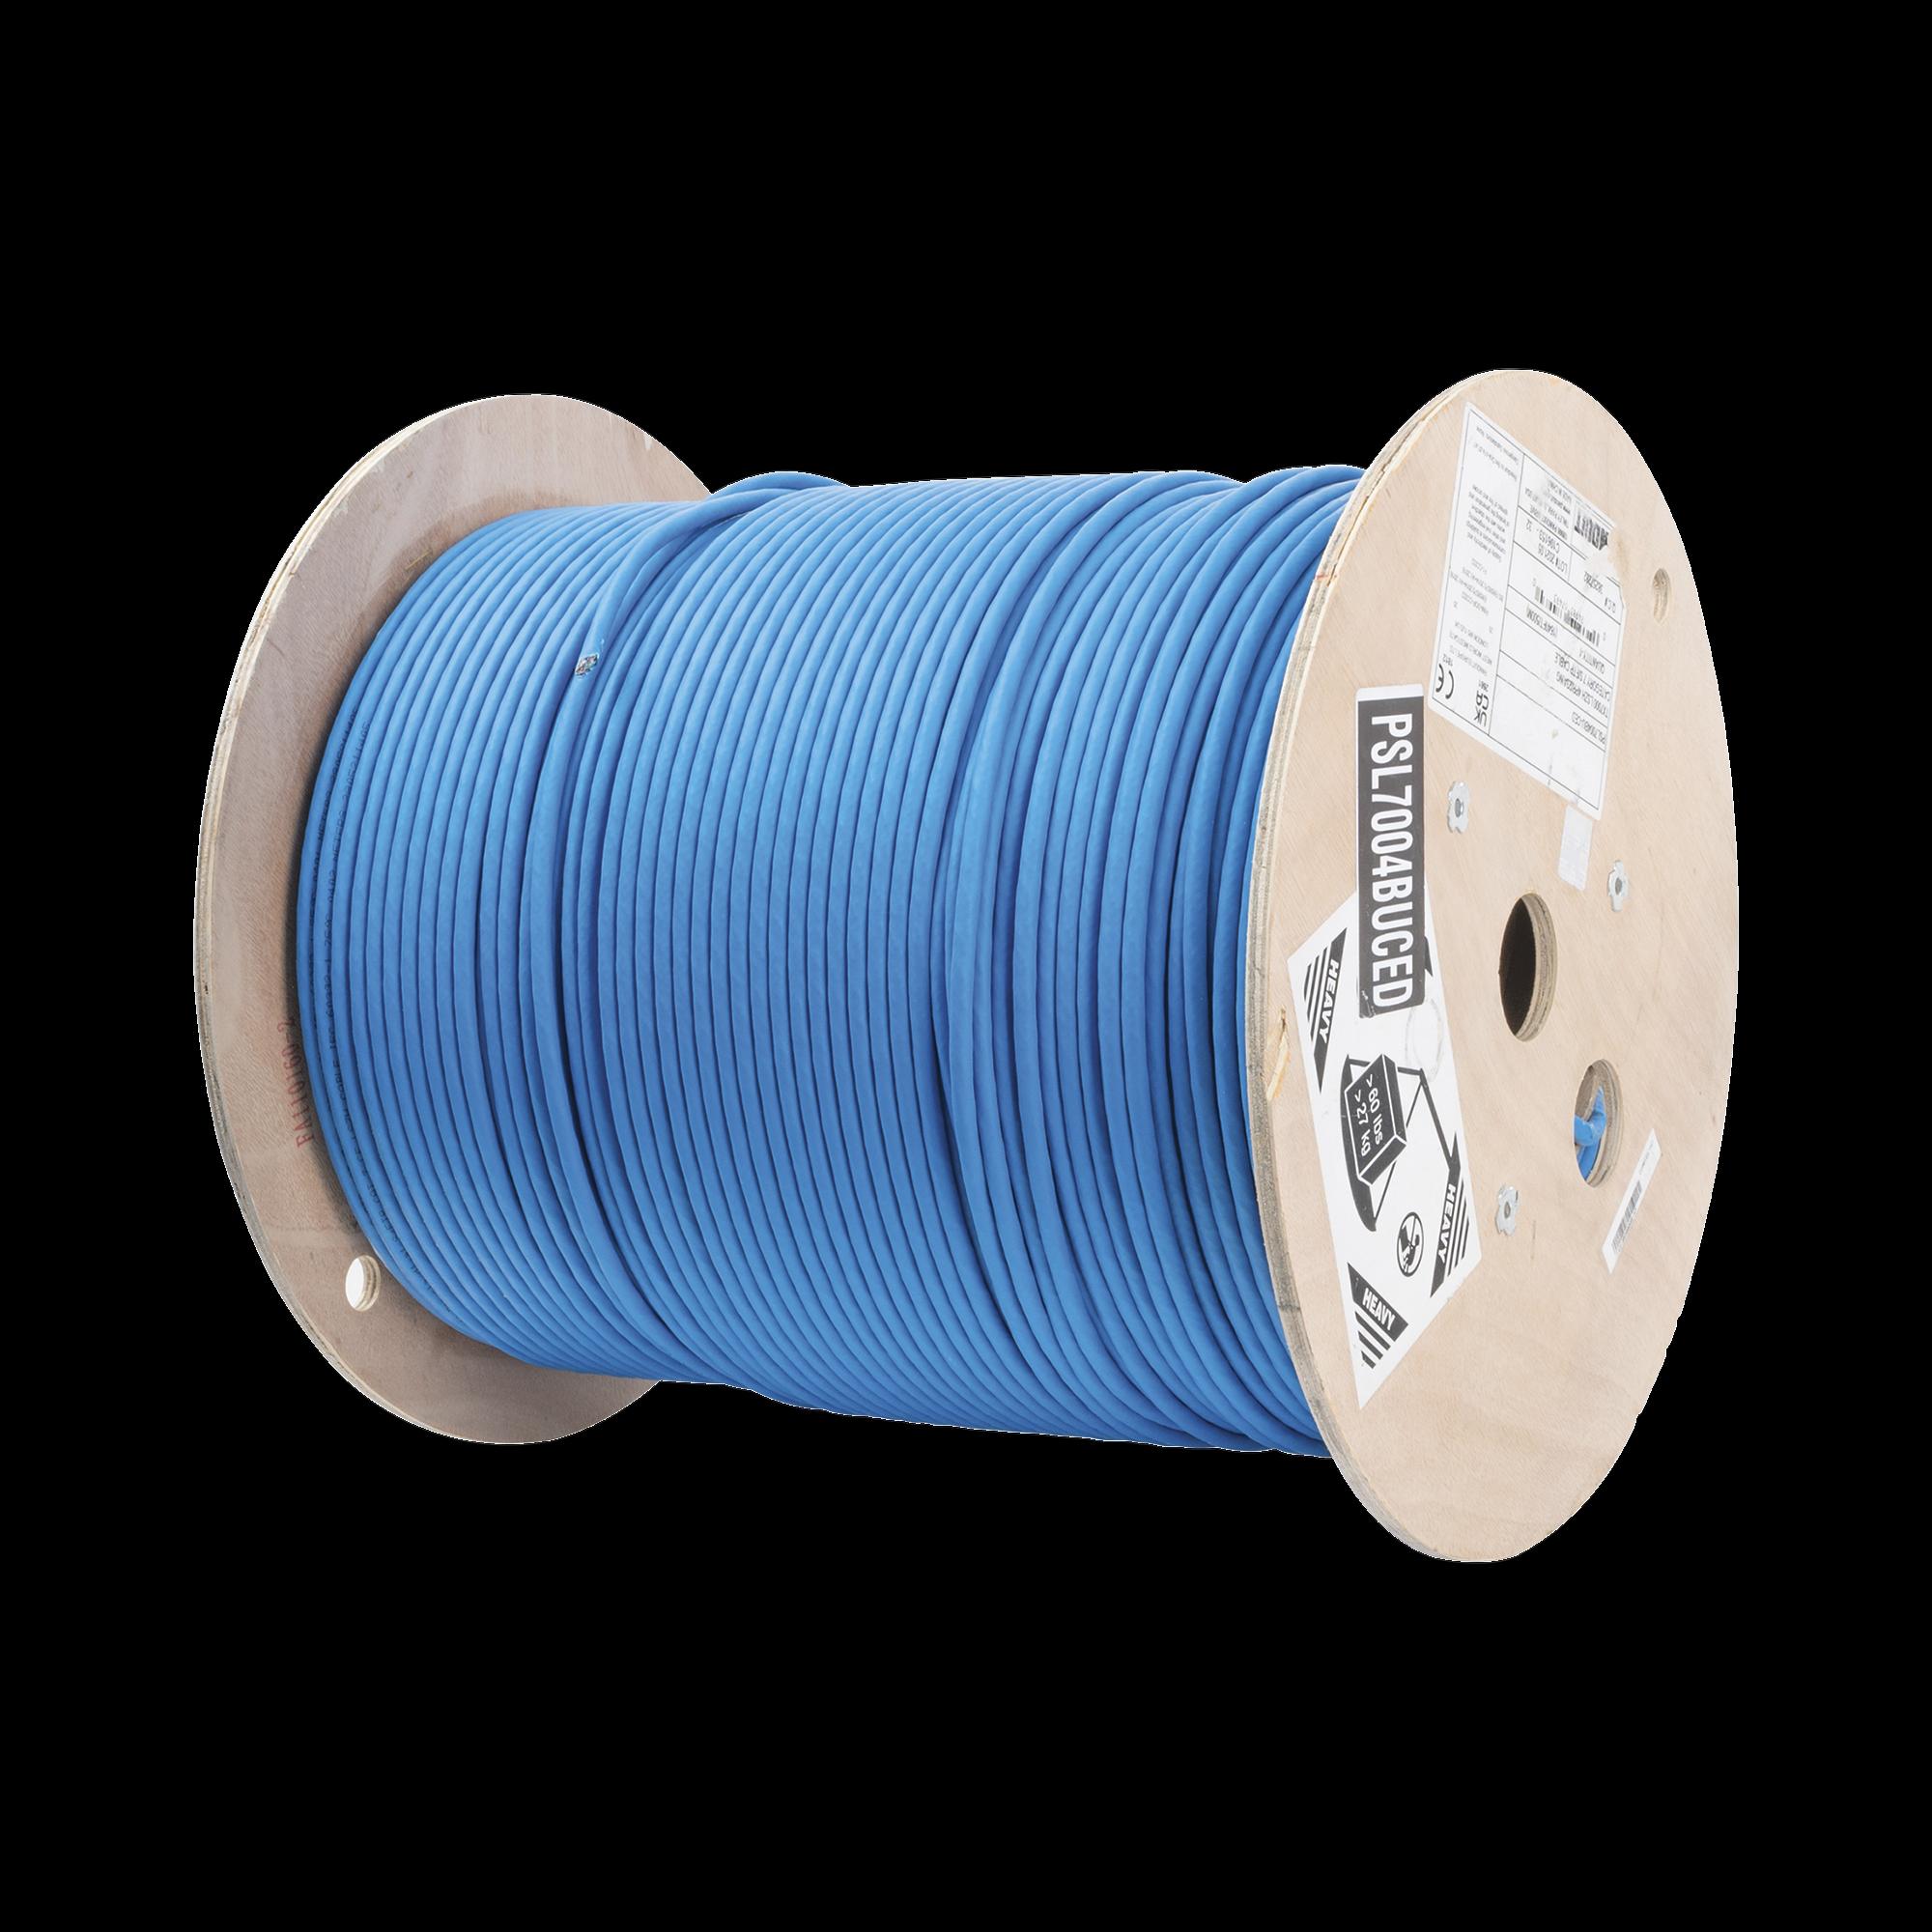 Bobina de Cable Blindado S/FTP de 4 pares, Cat7, Inmune a Ruido e Interferencias, LSZH (Bajo humo, Cero Halógenos), Color Azul, Bobina de 500 m